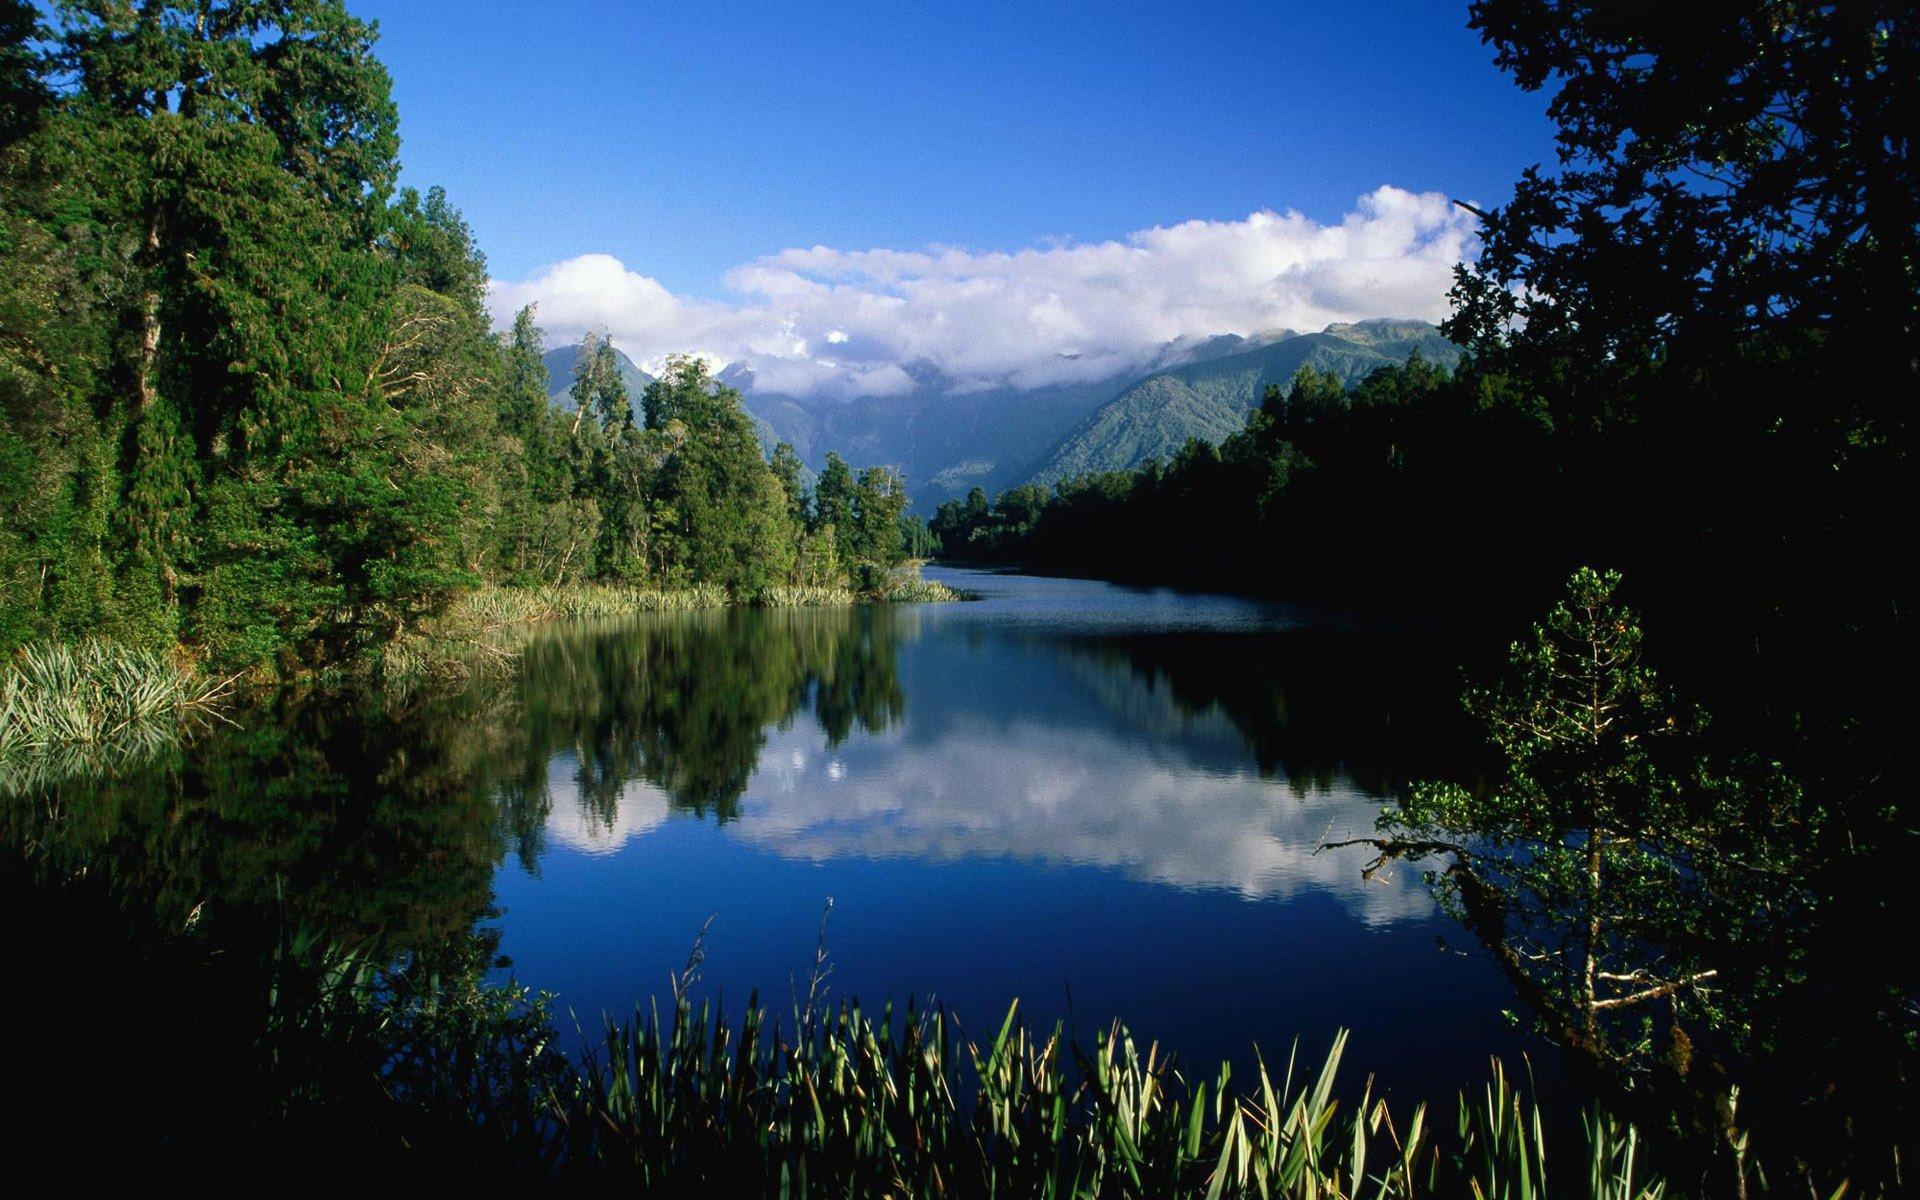 android安卓山水风景 上水 风景 景色 山水如画 自然